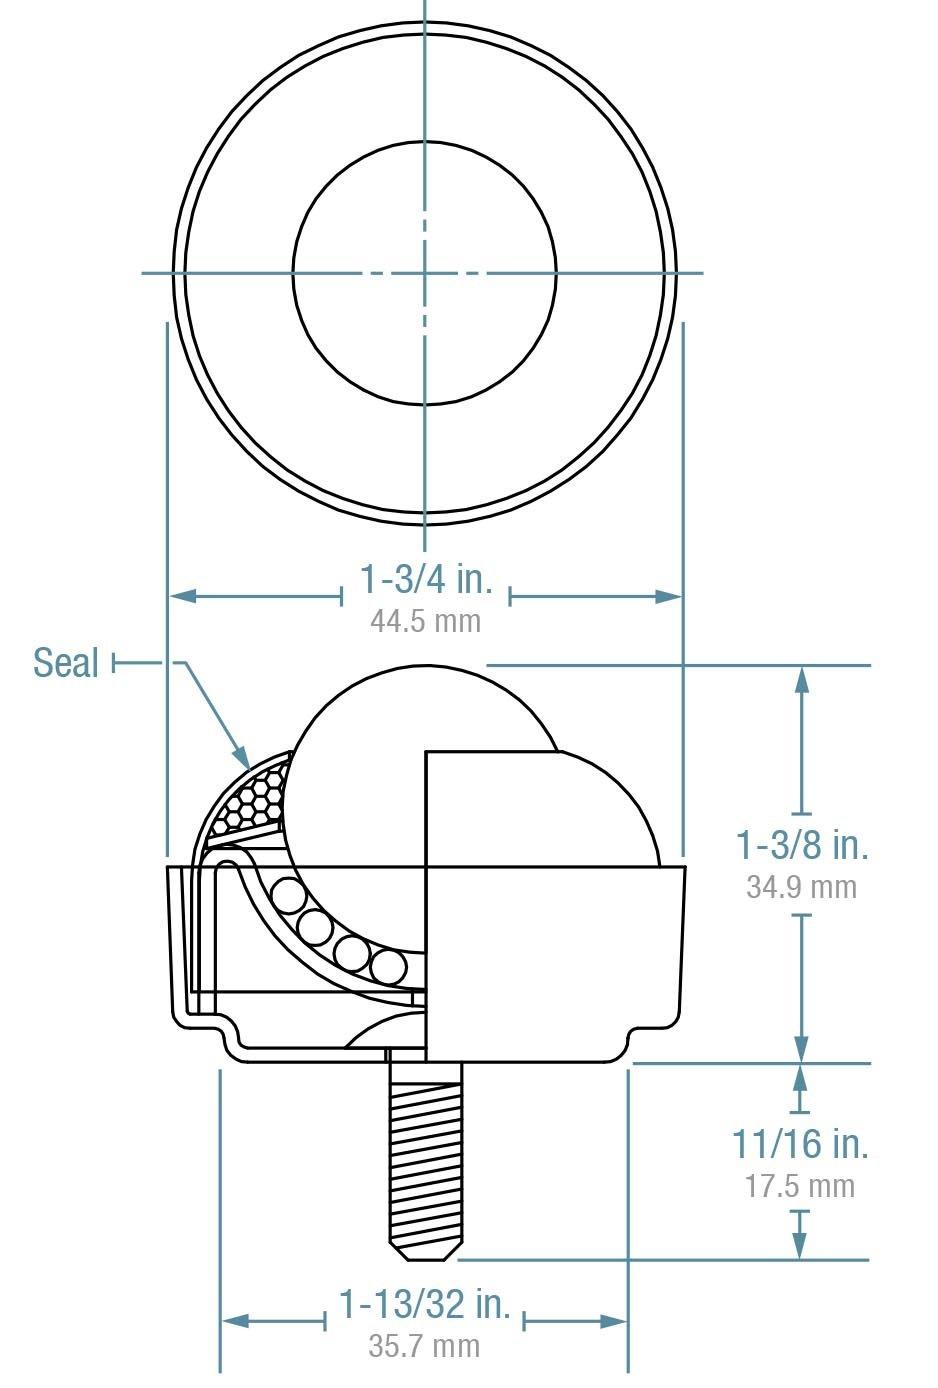 1//4-20 Thread Stem Case of 10 Carbon Steel Hudson Bearings SBT-1 Stud Mounted Nylon Ball Transfer Case of 10 1 Diameter 35 lbs Load Capacity 1 Diameter 1//4-20 Thread Stem